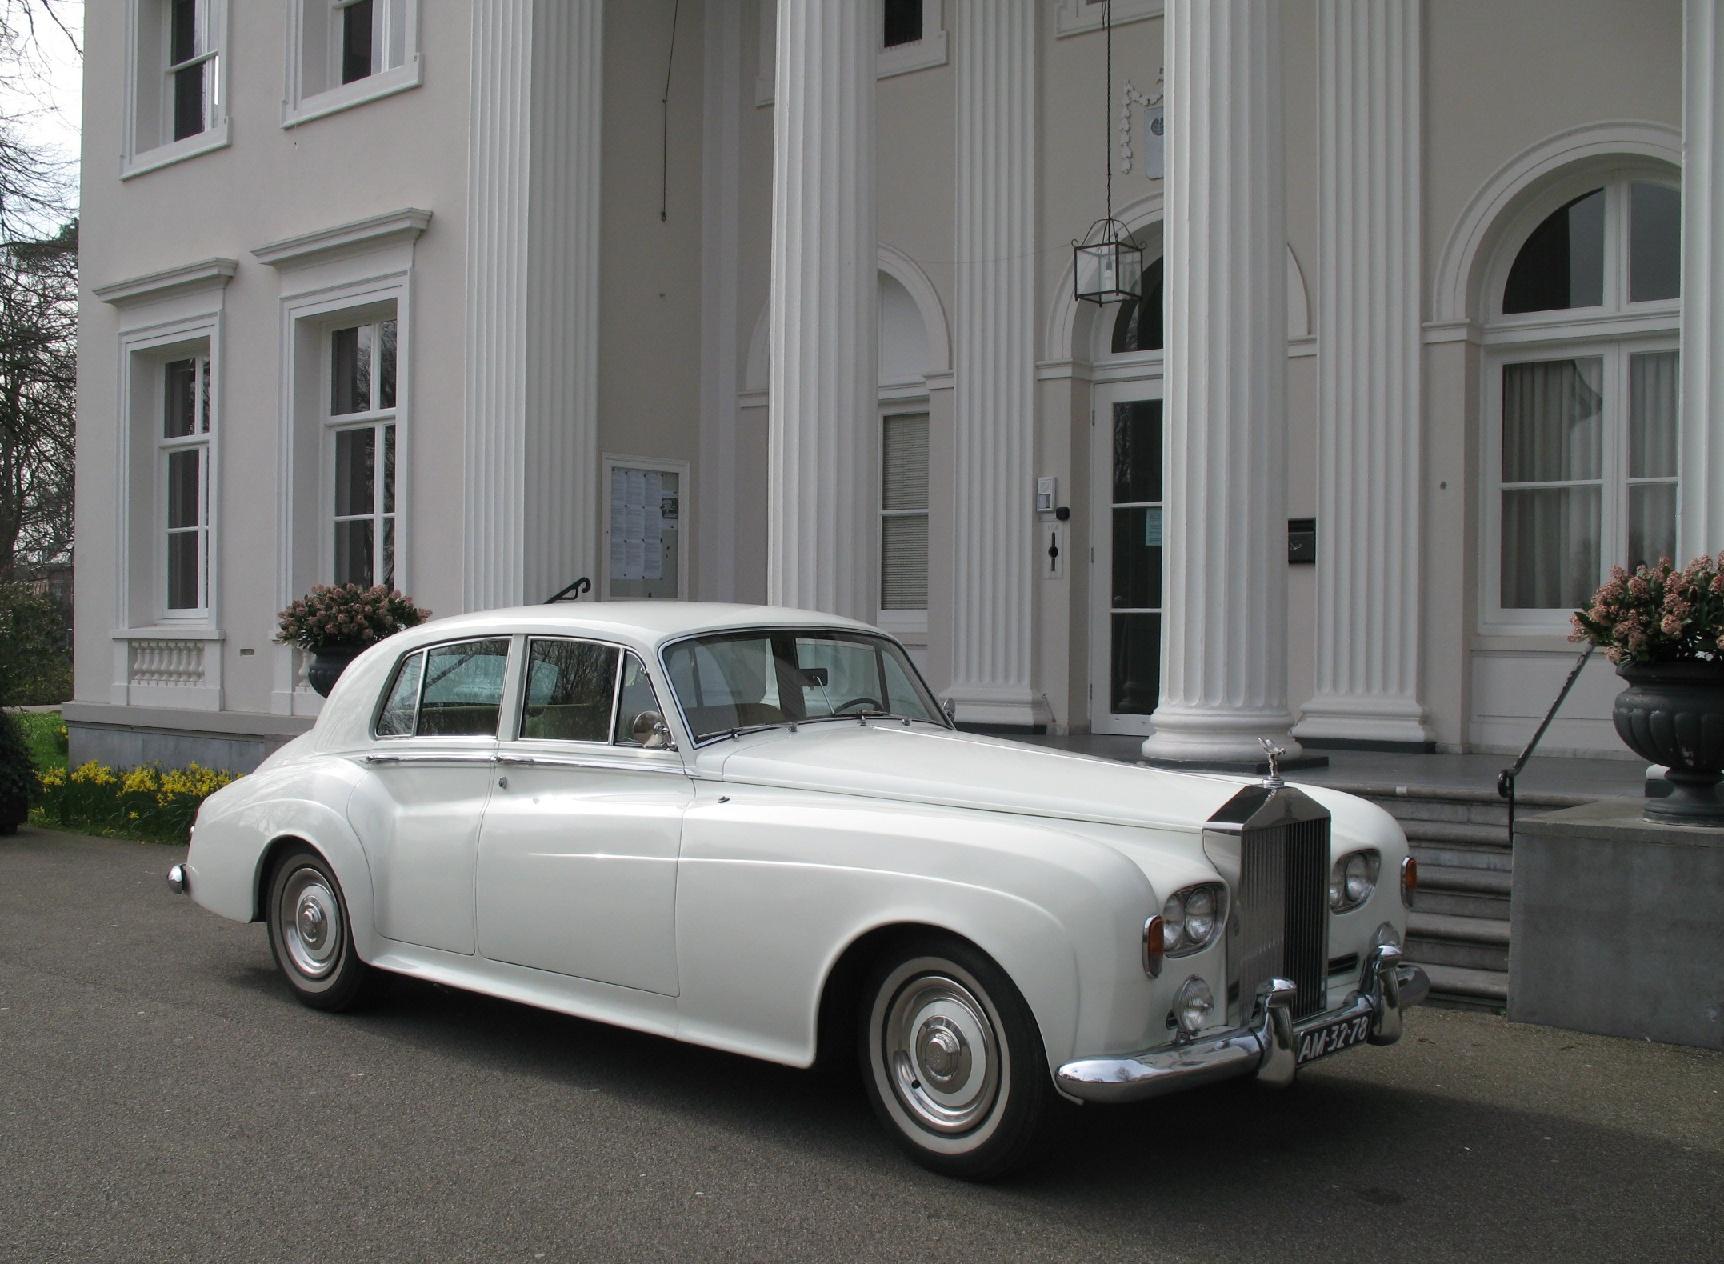 Oldtimer-Mallorca-Oldtimer-mieten-Mallorca-Rolls-Royce-Silver-Cloud-1963-2